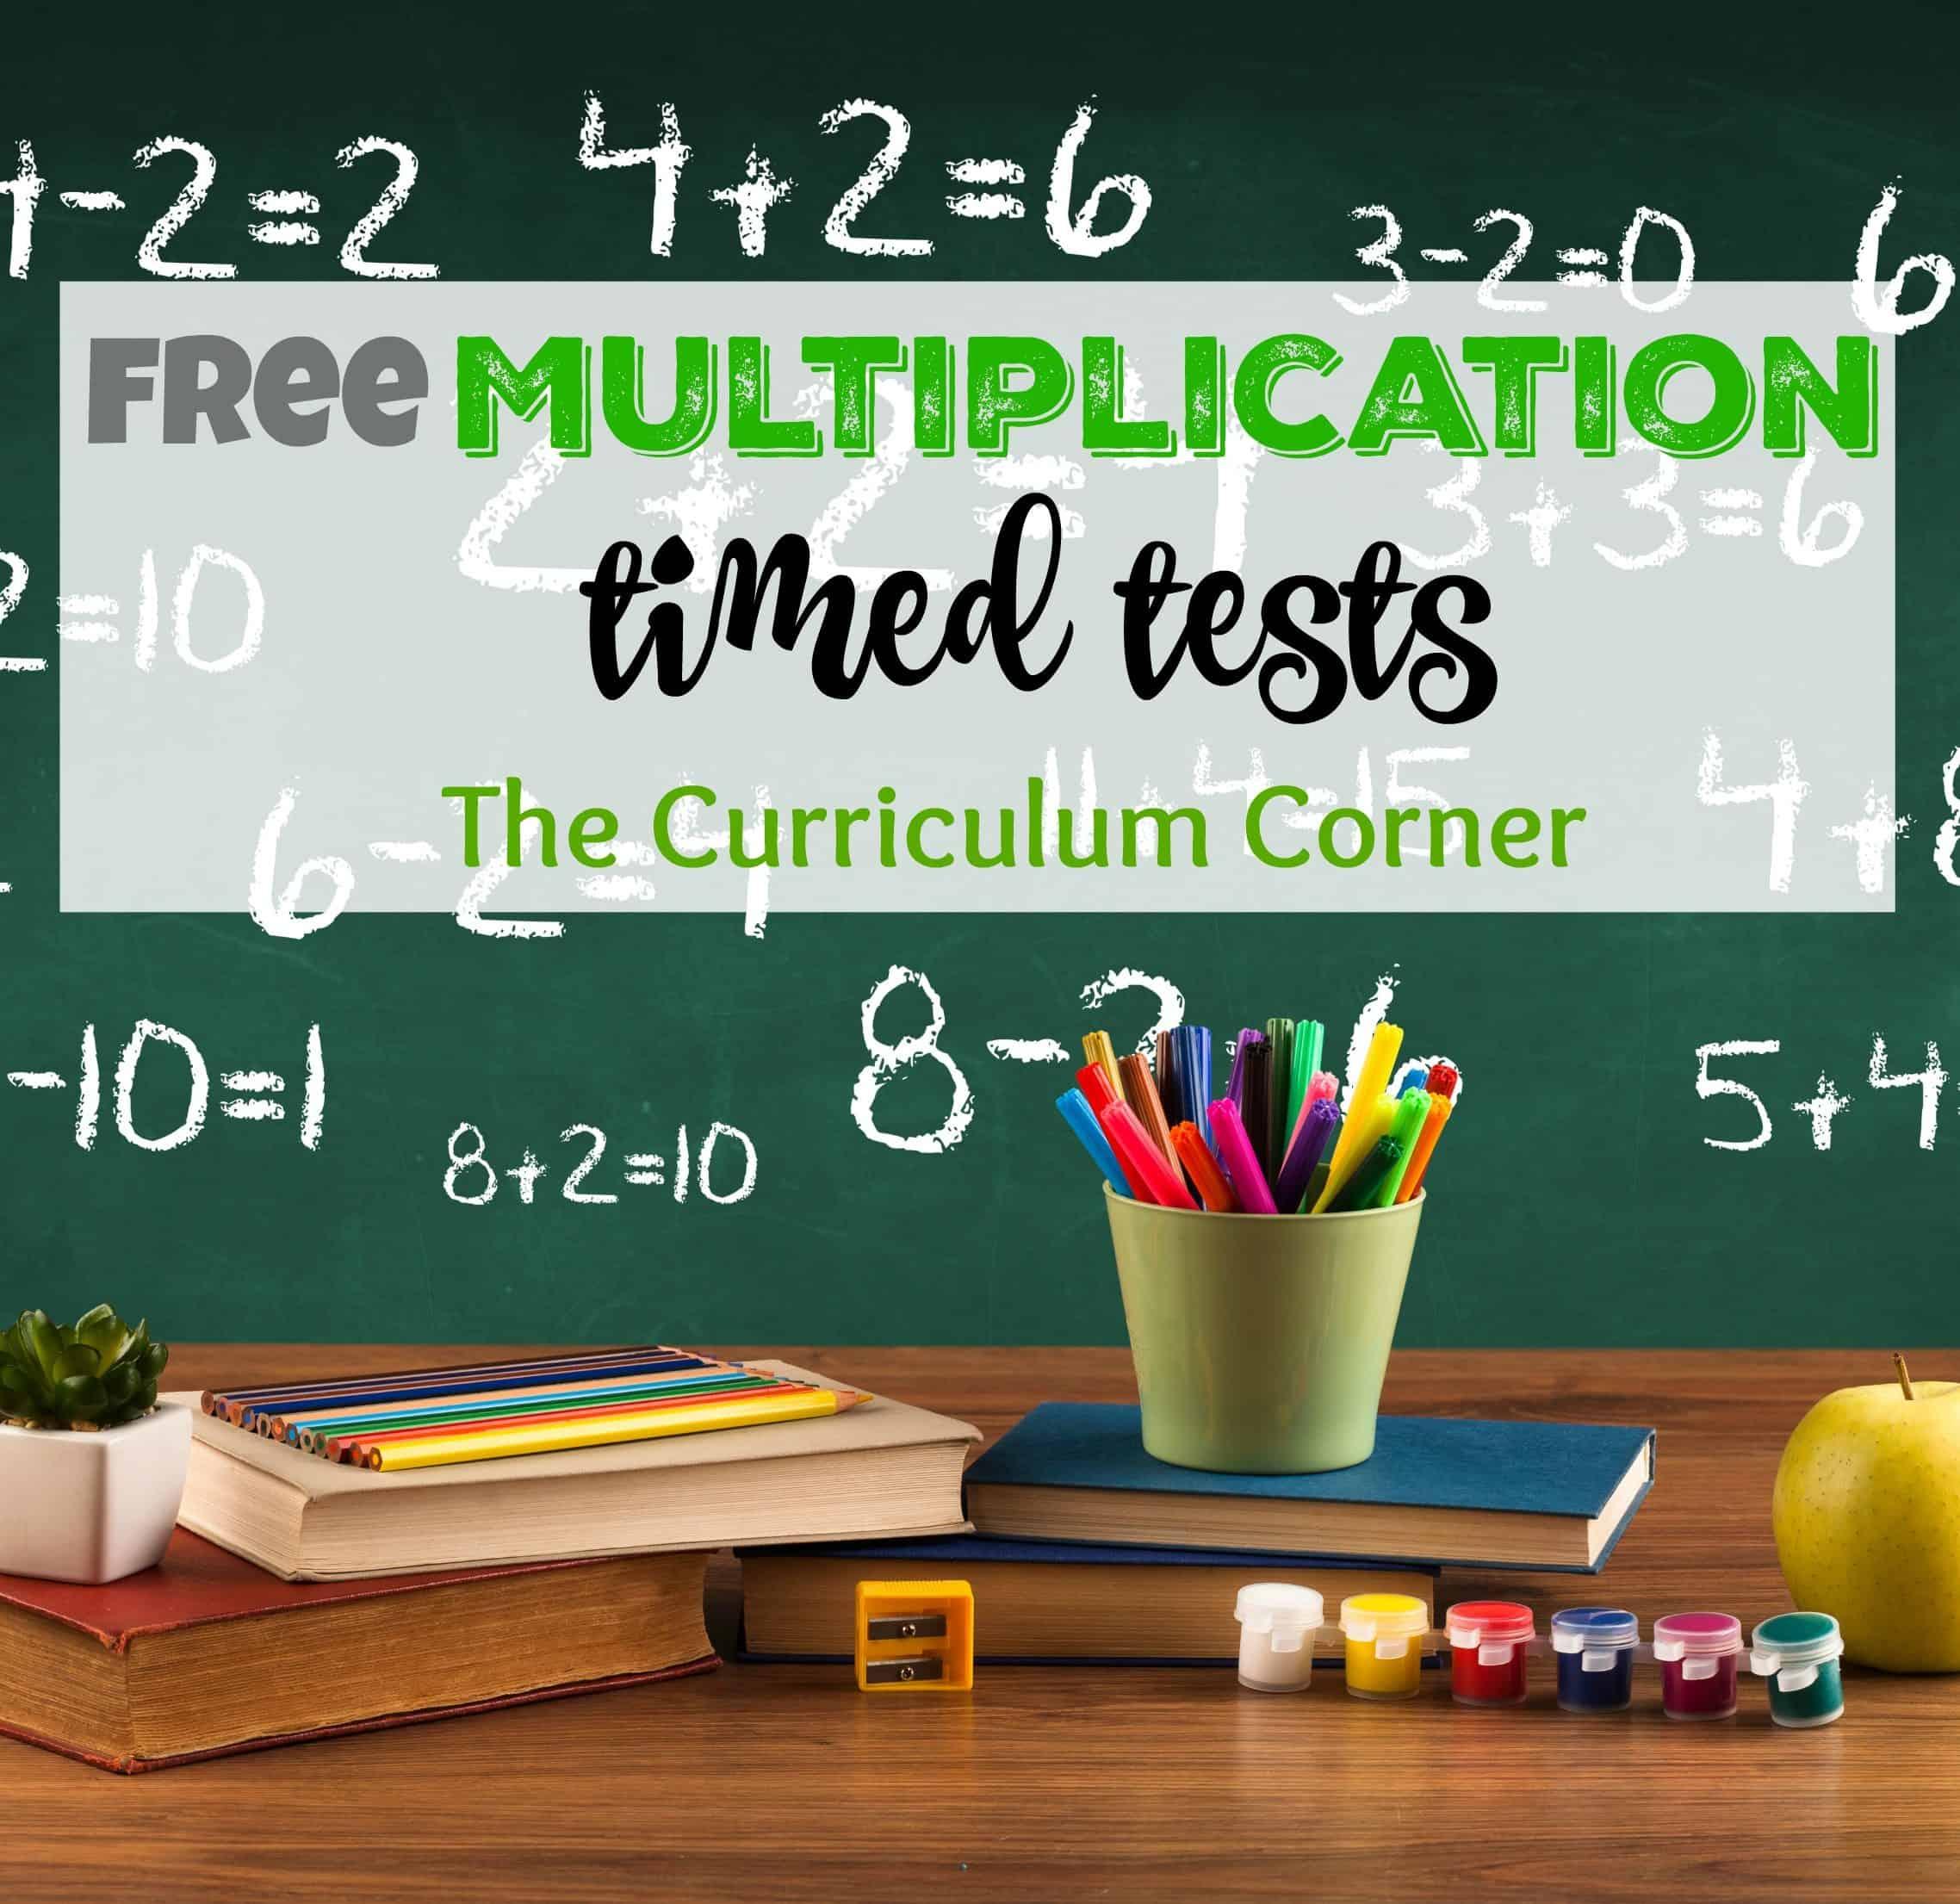 medium resolution of Multiplication Timed Tests - The Curriculum Corner 123